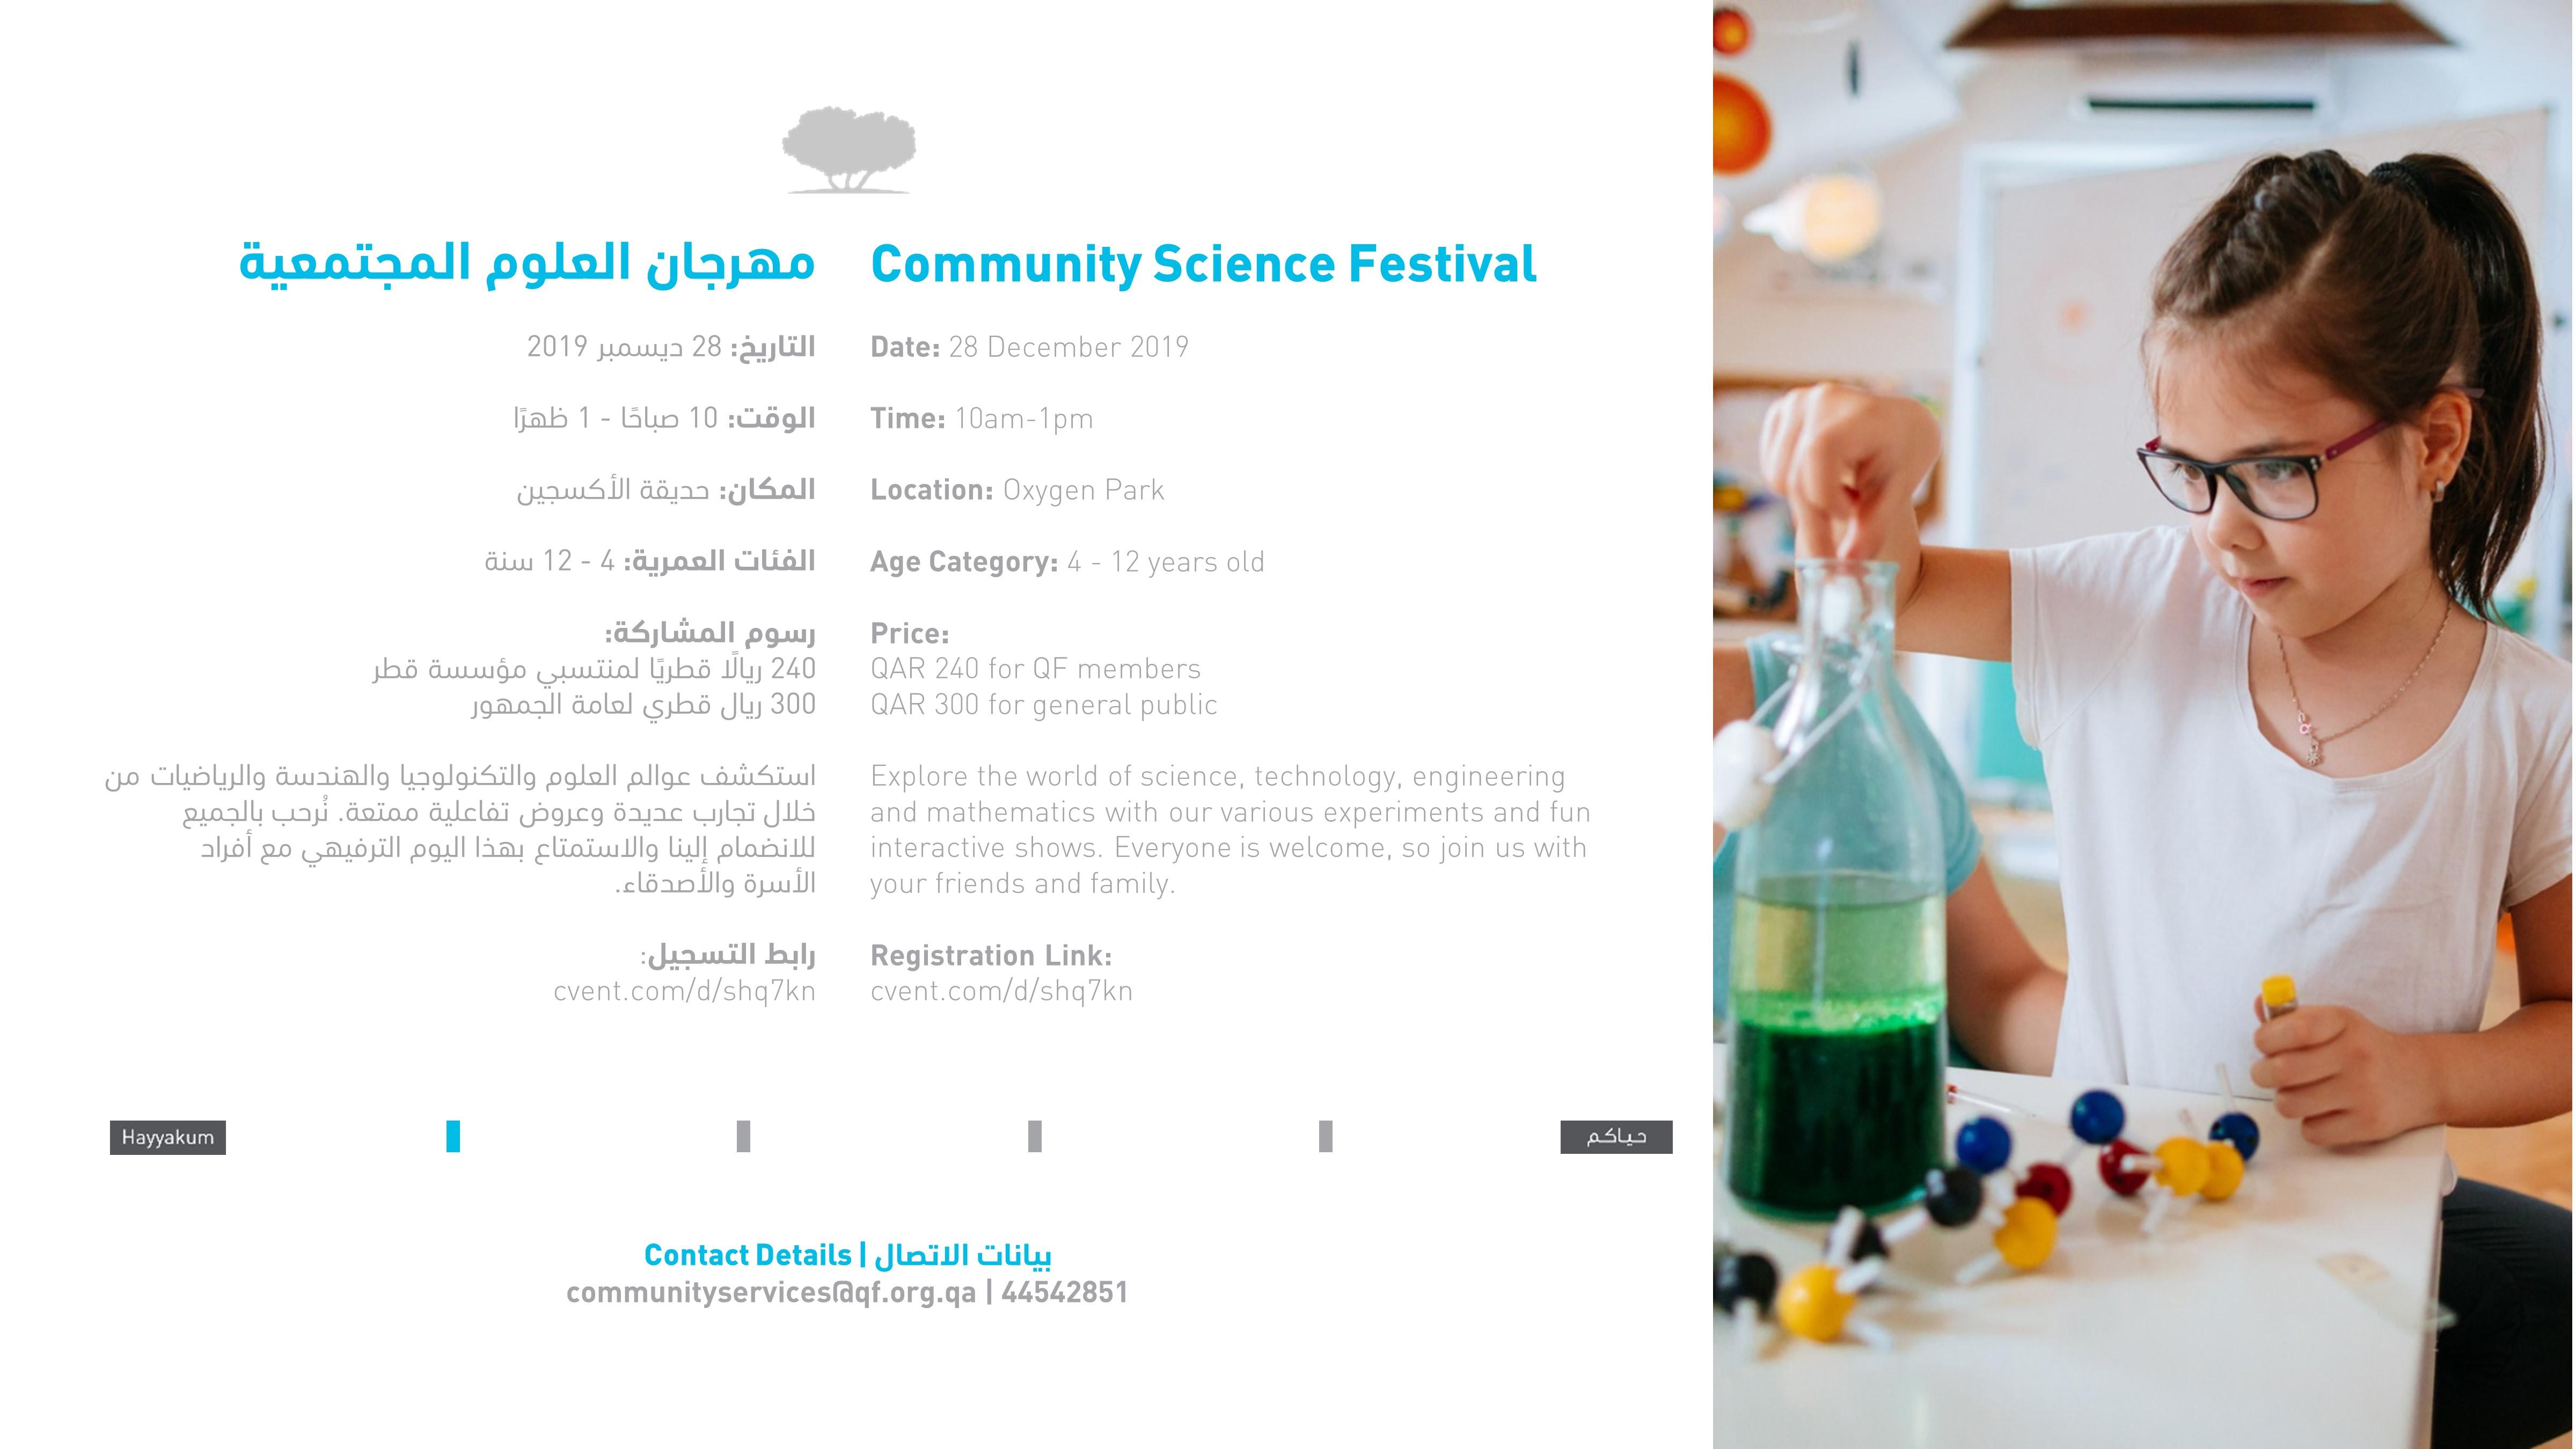 Community Science Festival